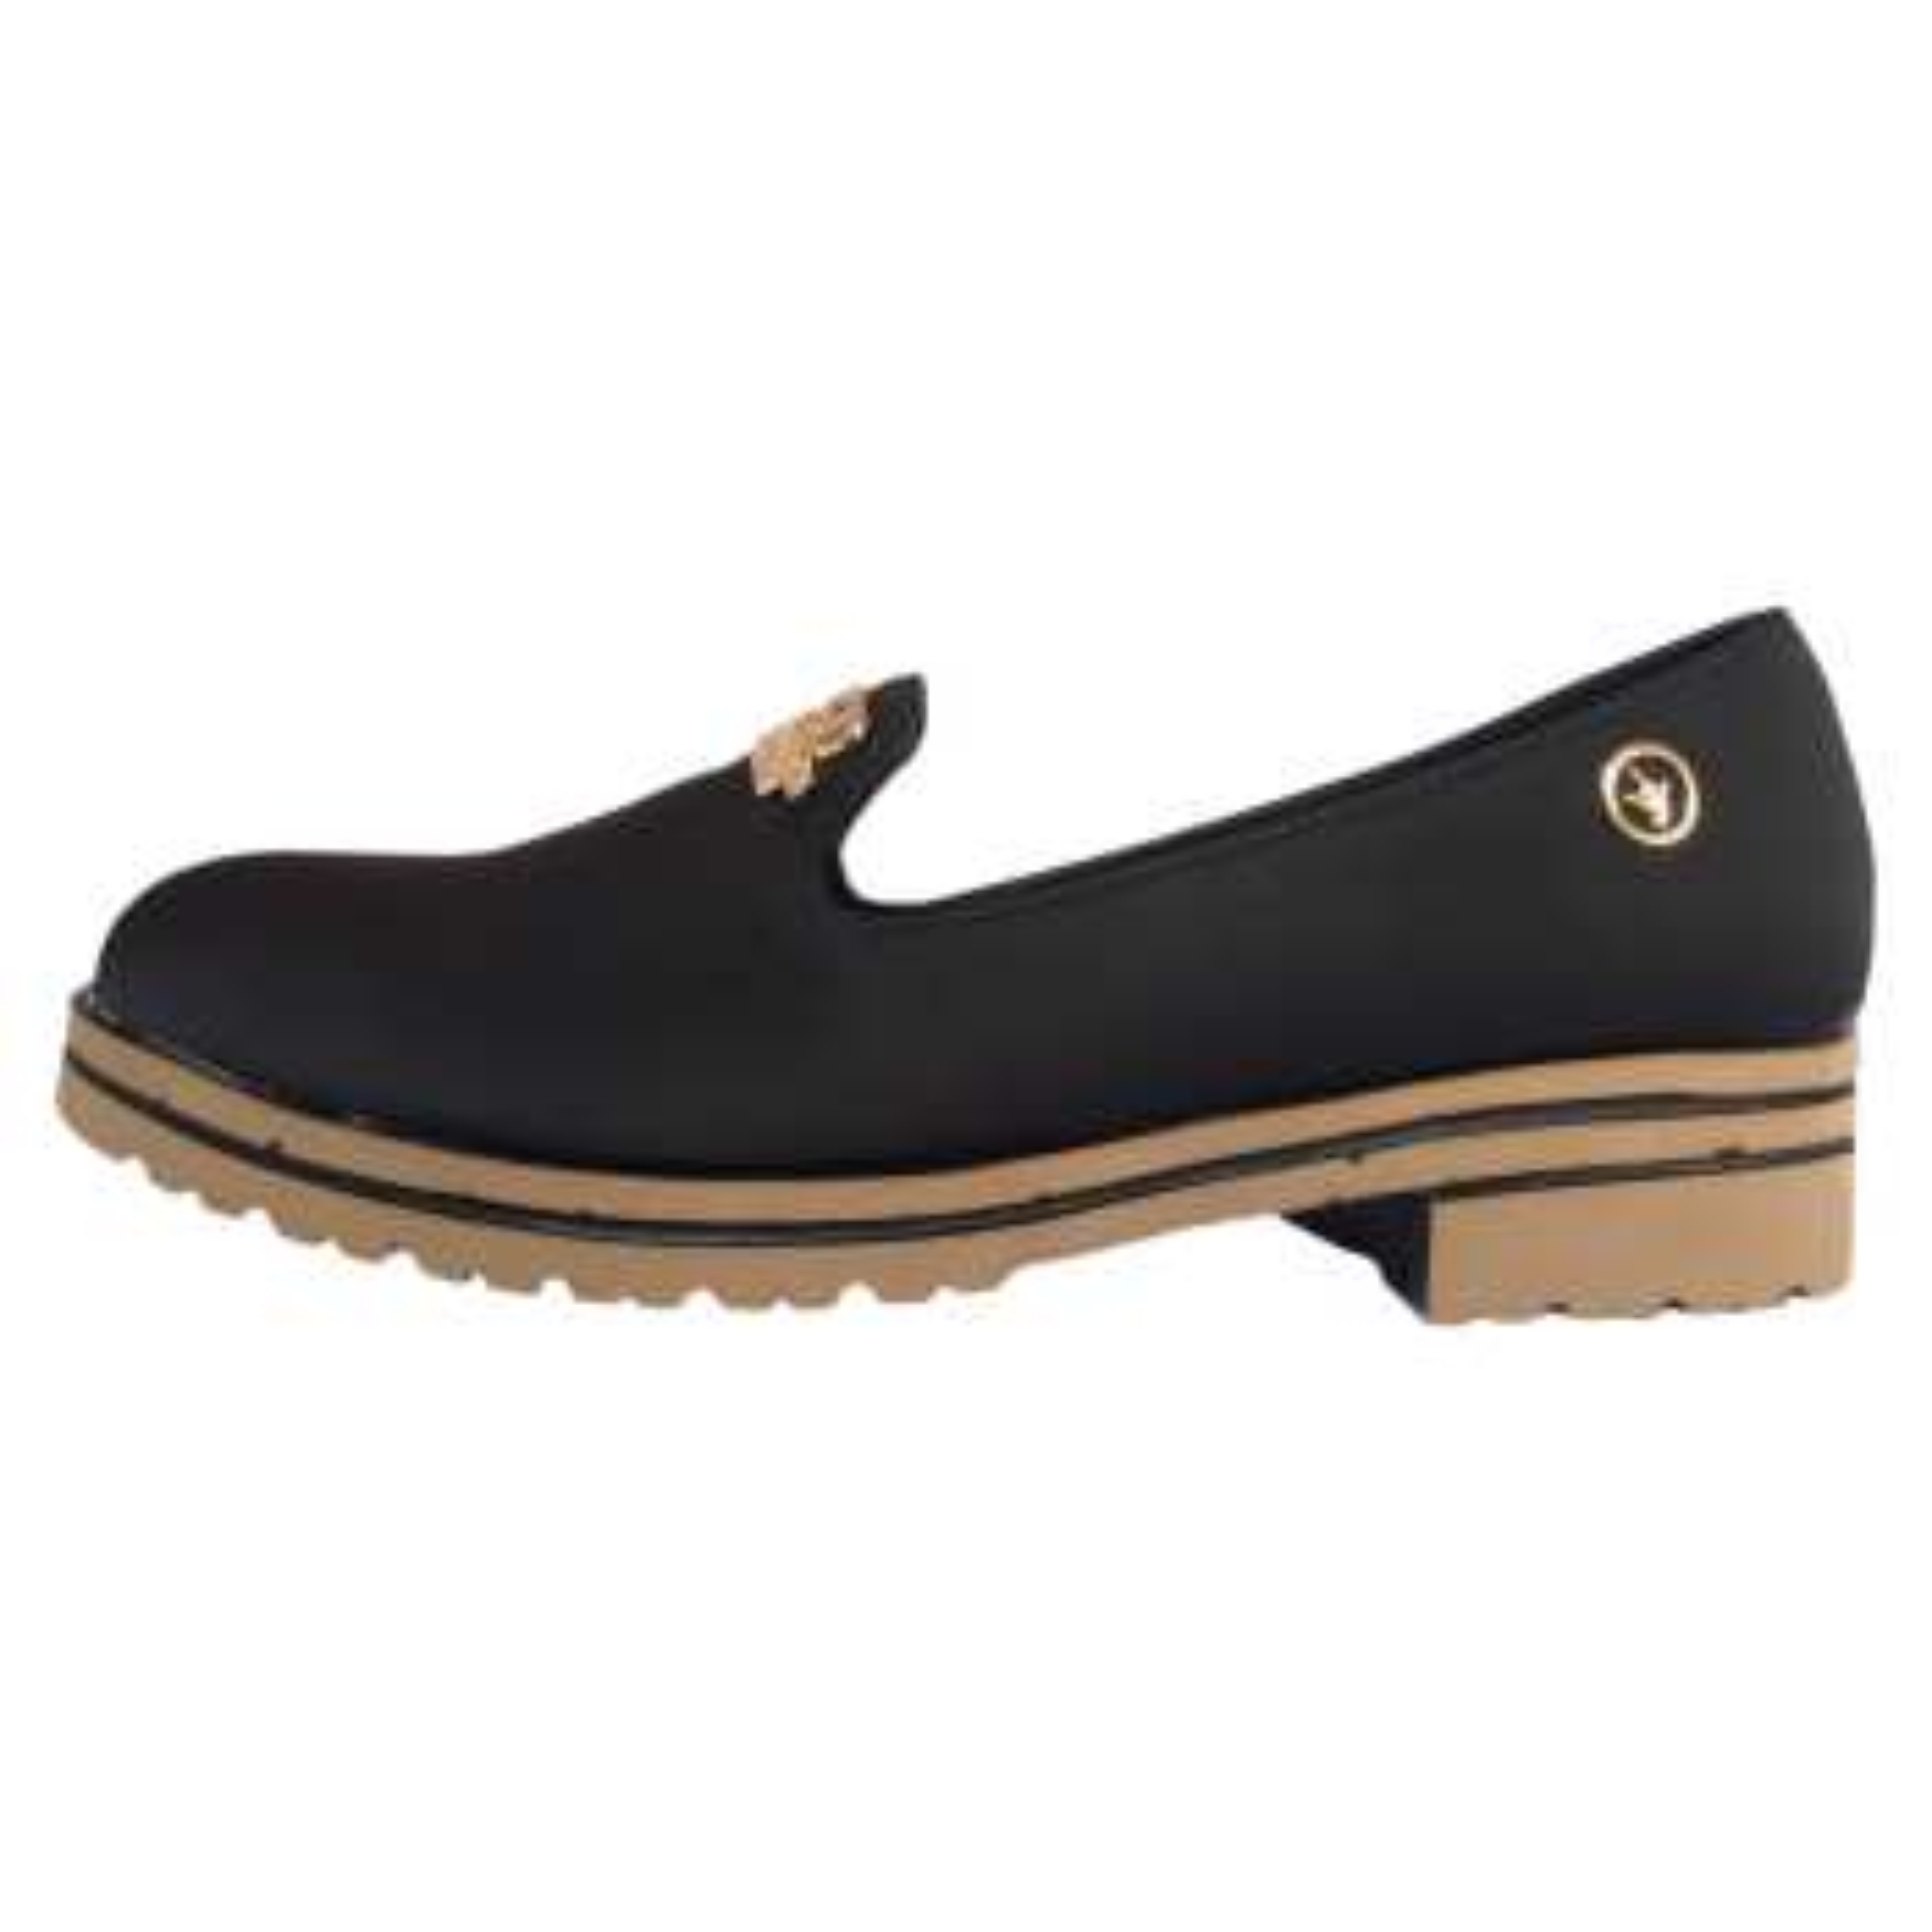 کفش روزمره زنانه کد 322AB